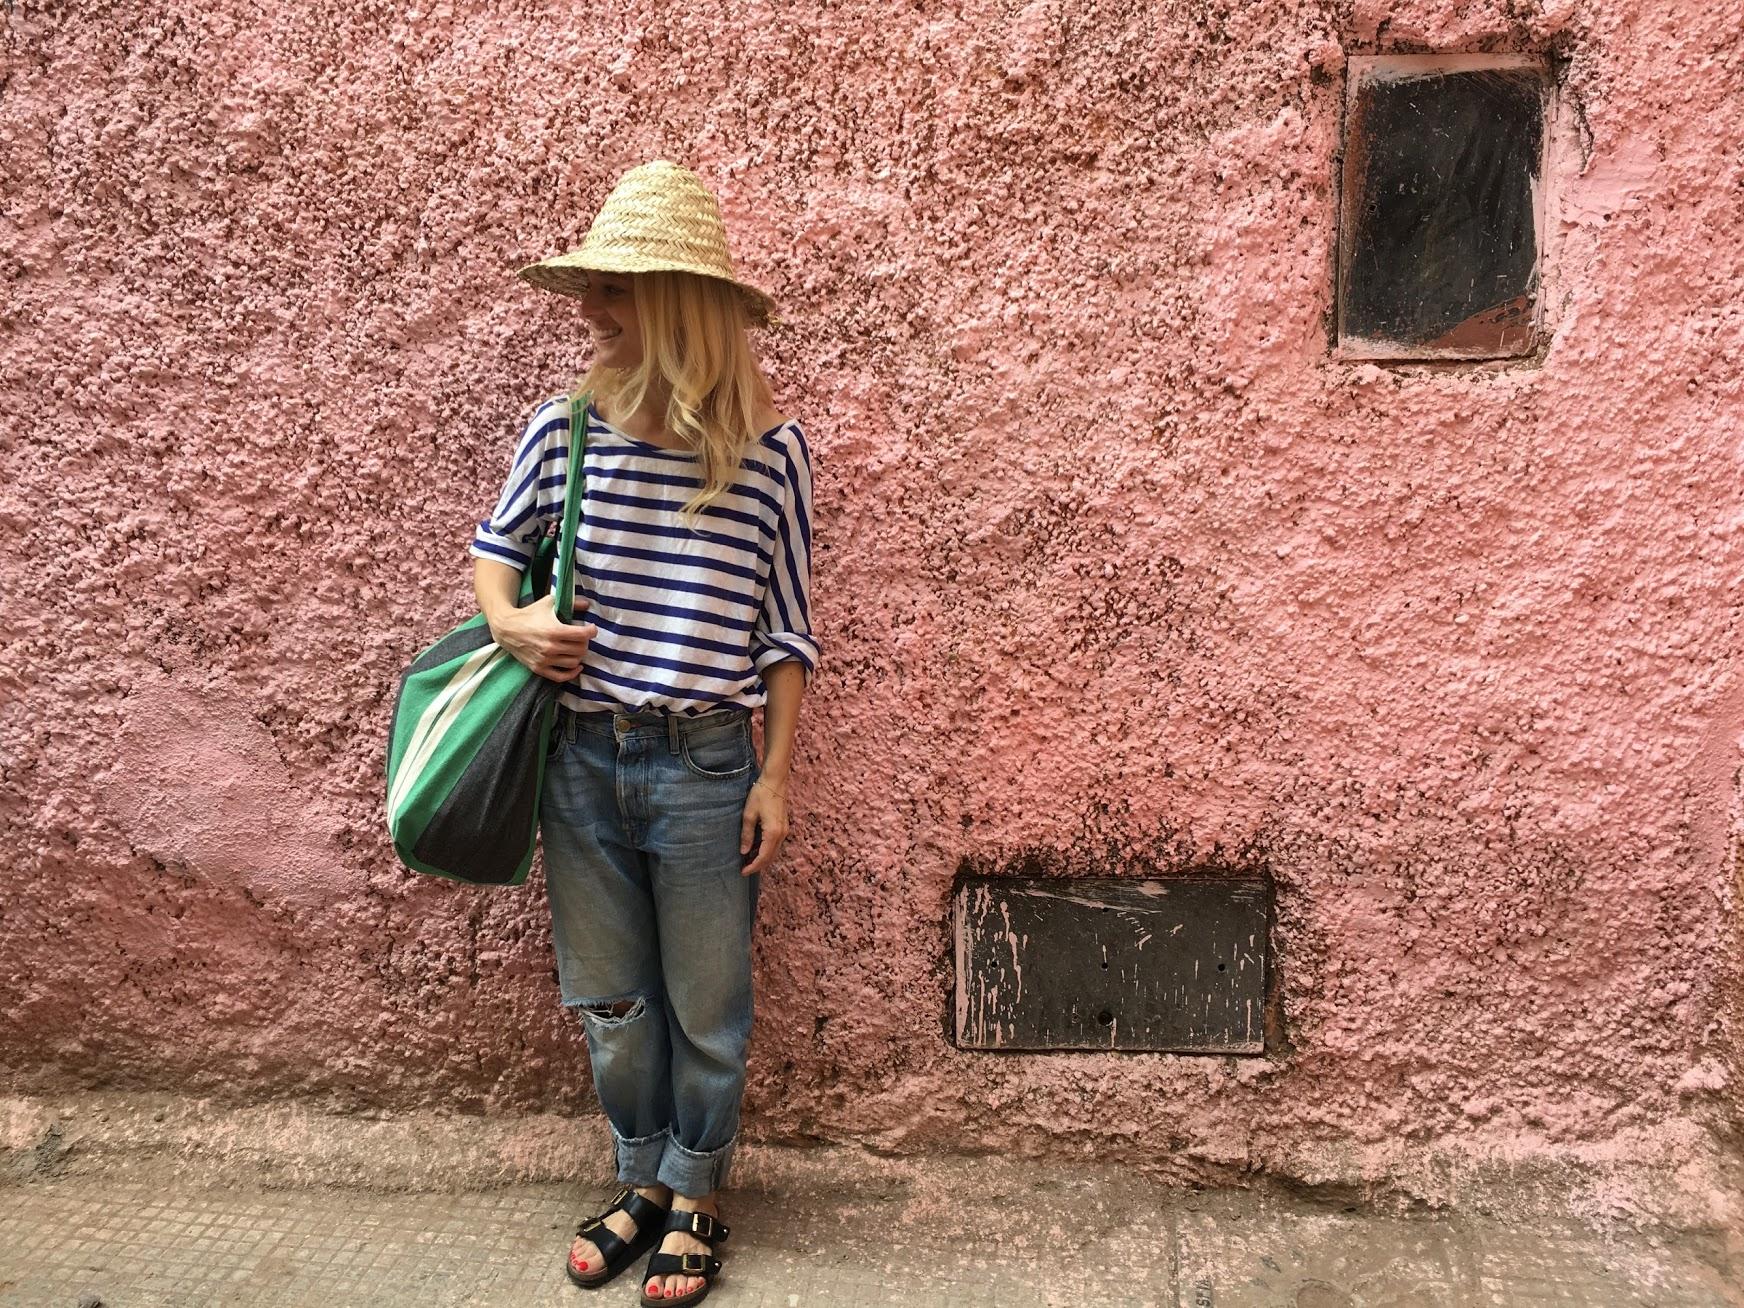 Ph: Me in the Medina, shot by Liz Brown